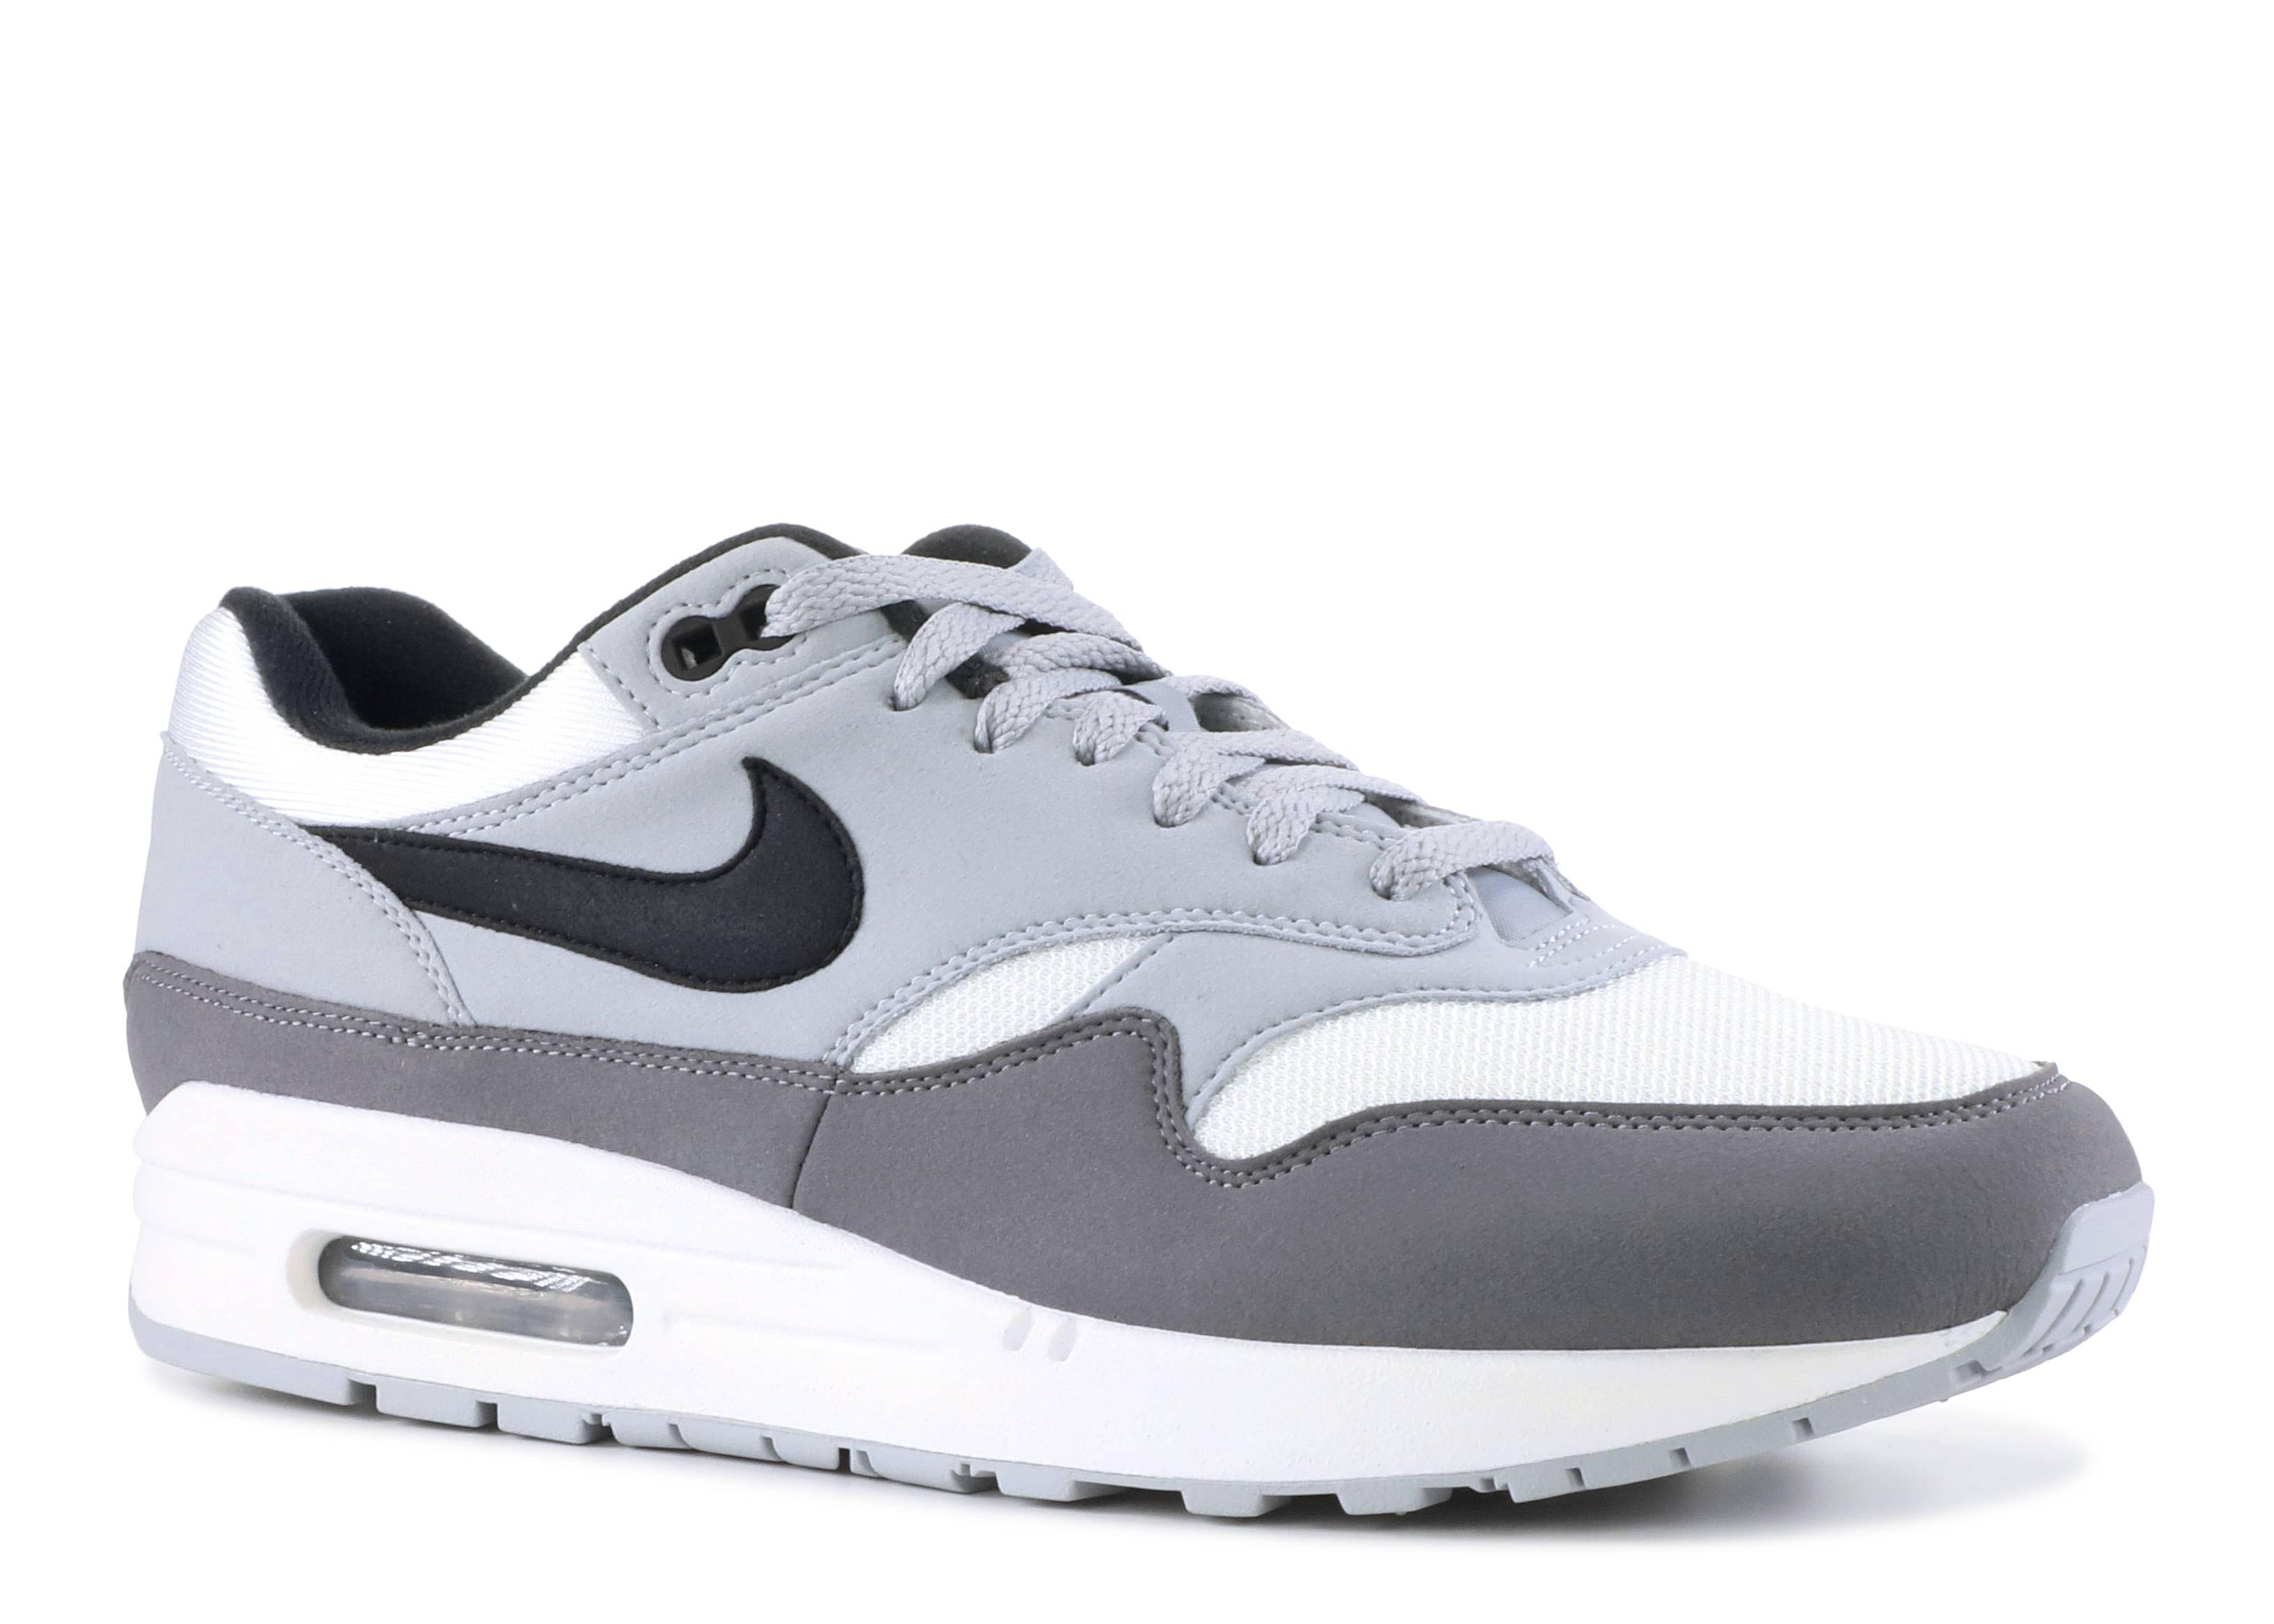 outlet store cd859 d2107 Air Max 1 - Nike - AH8145 101 - white black-wolf grey-gunsmoke   Flight Club